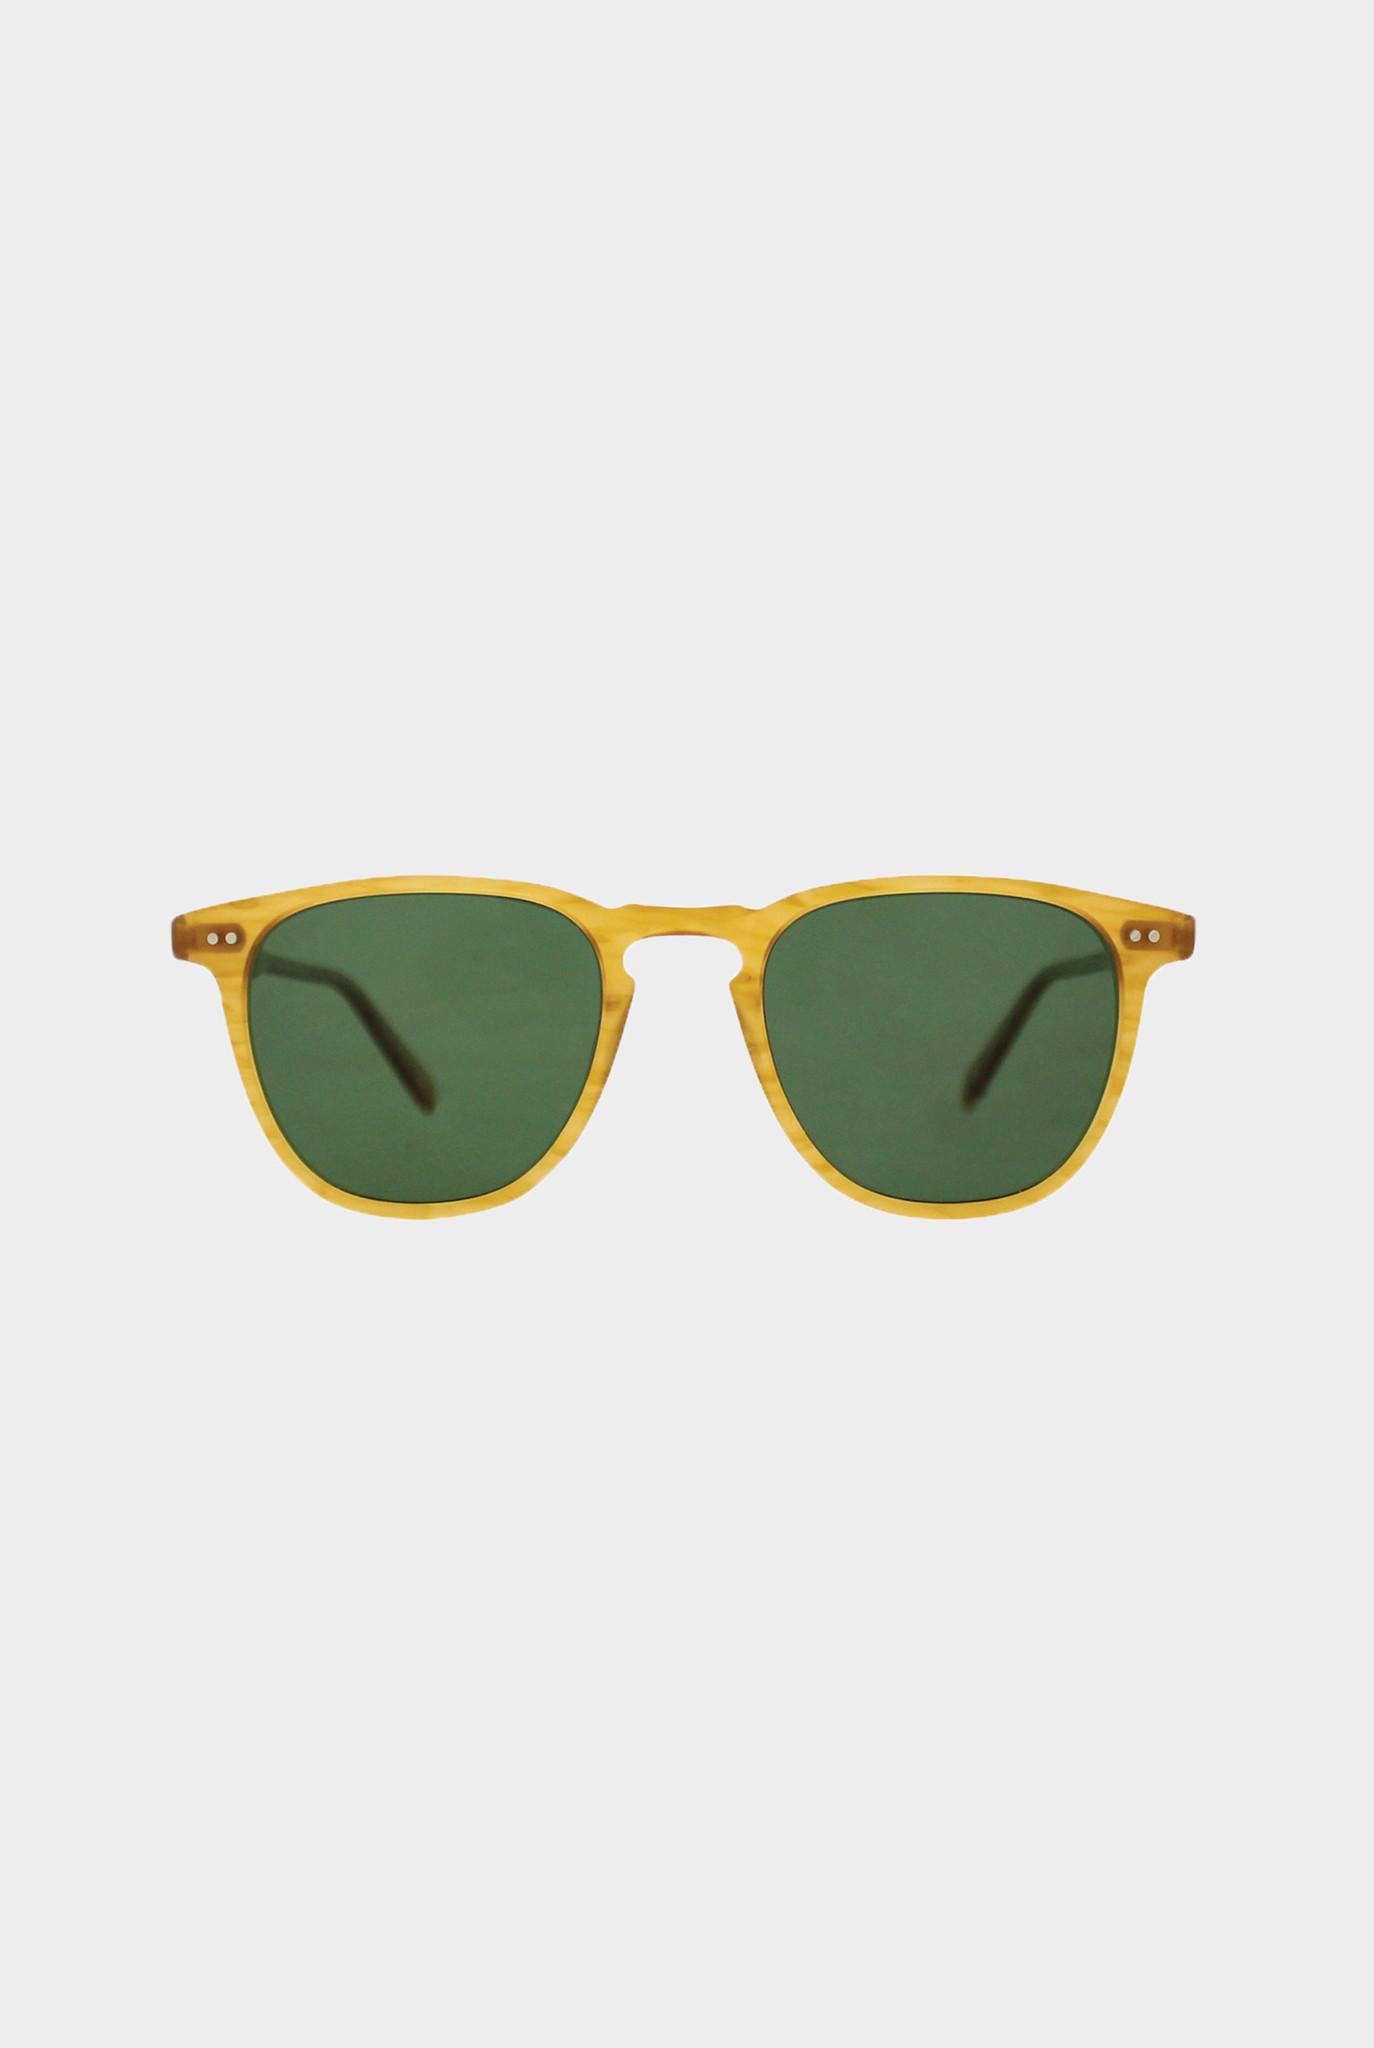 Brooks sunglasses butterscotch